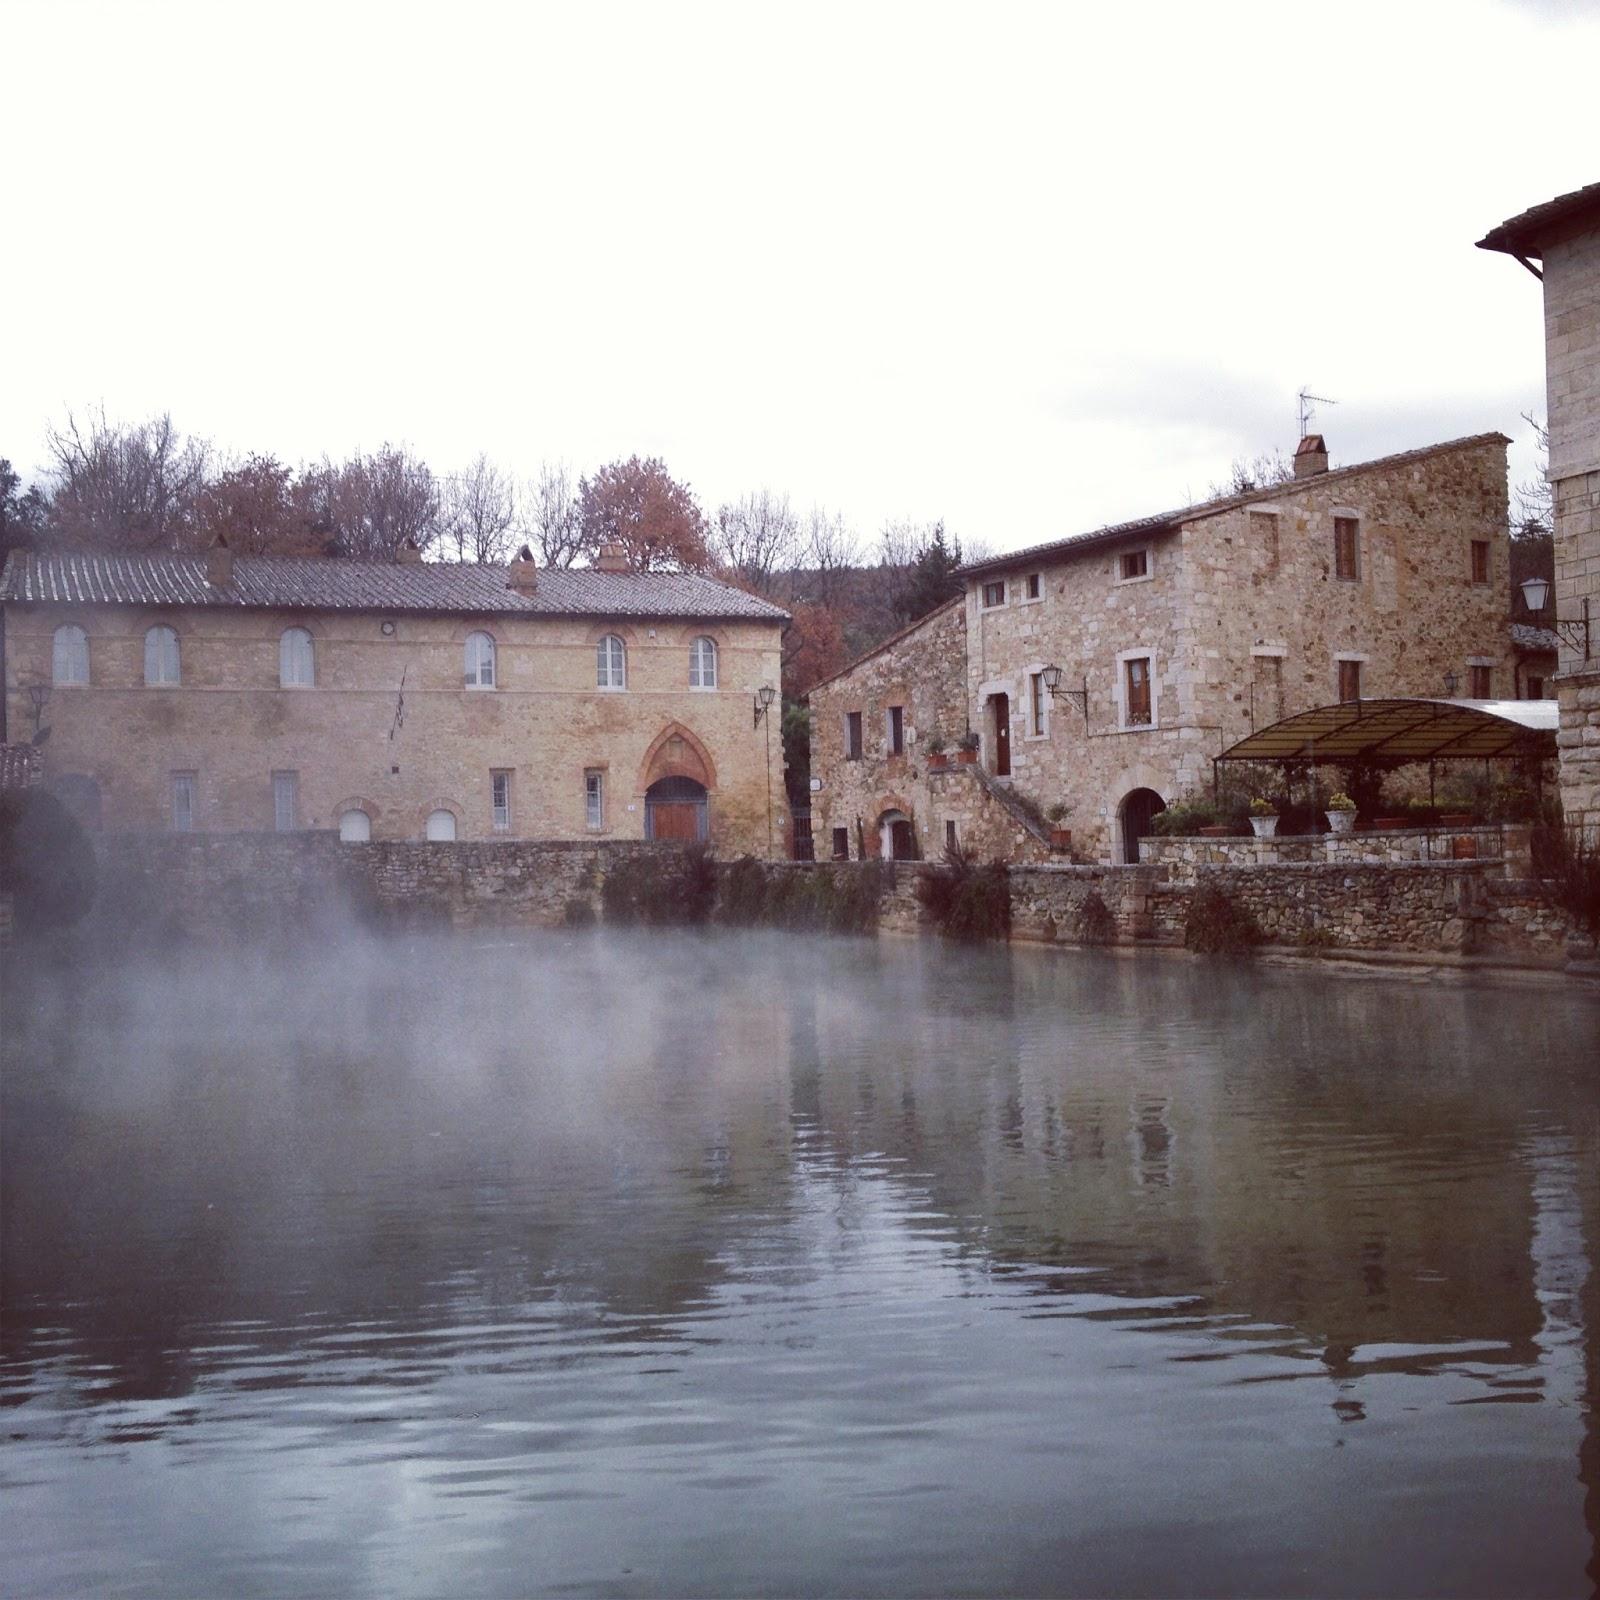 Bagno vignoni thermal baths in tuscany - Bagno a vignoni ...